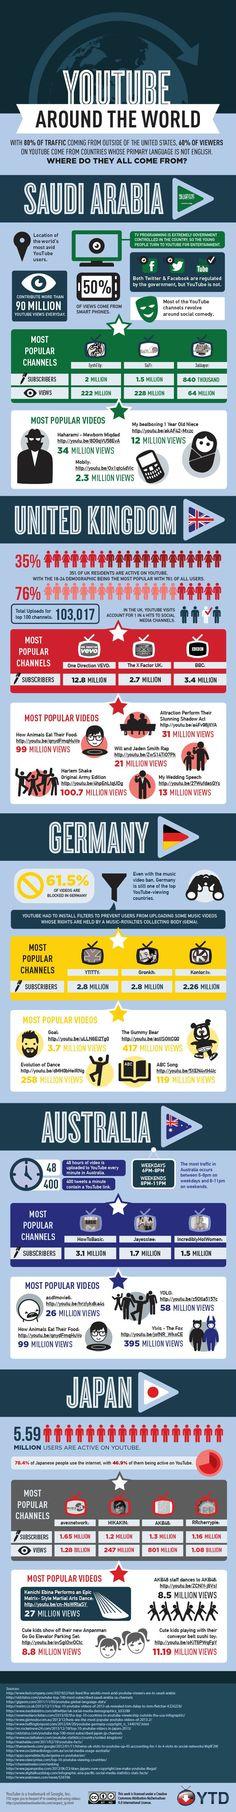 #YouTube Around The World - #infographic #socialmedia